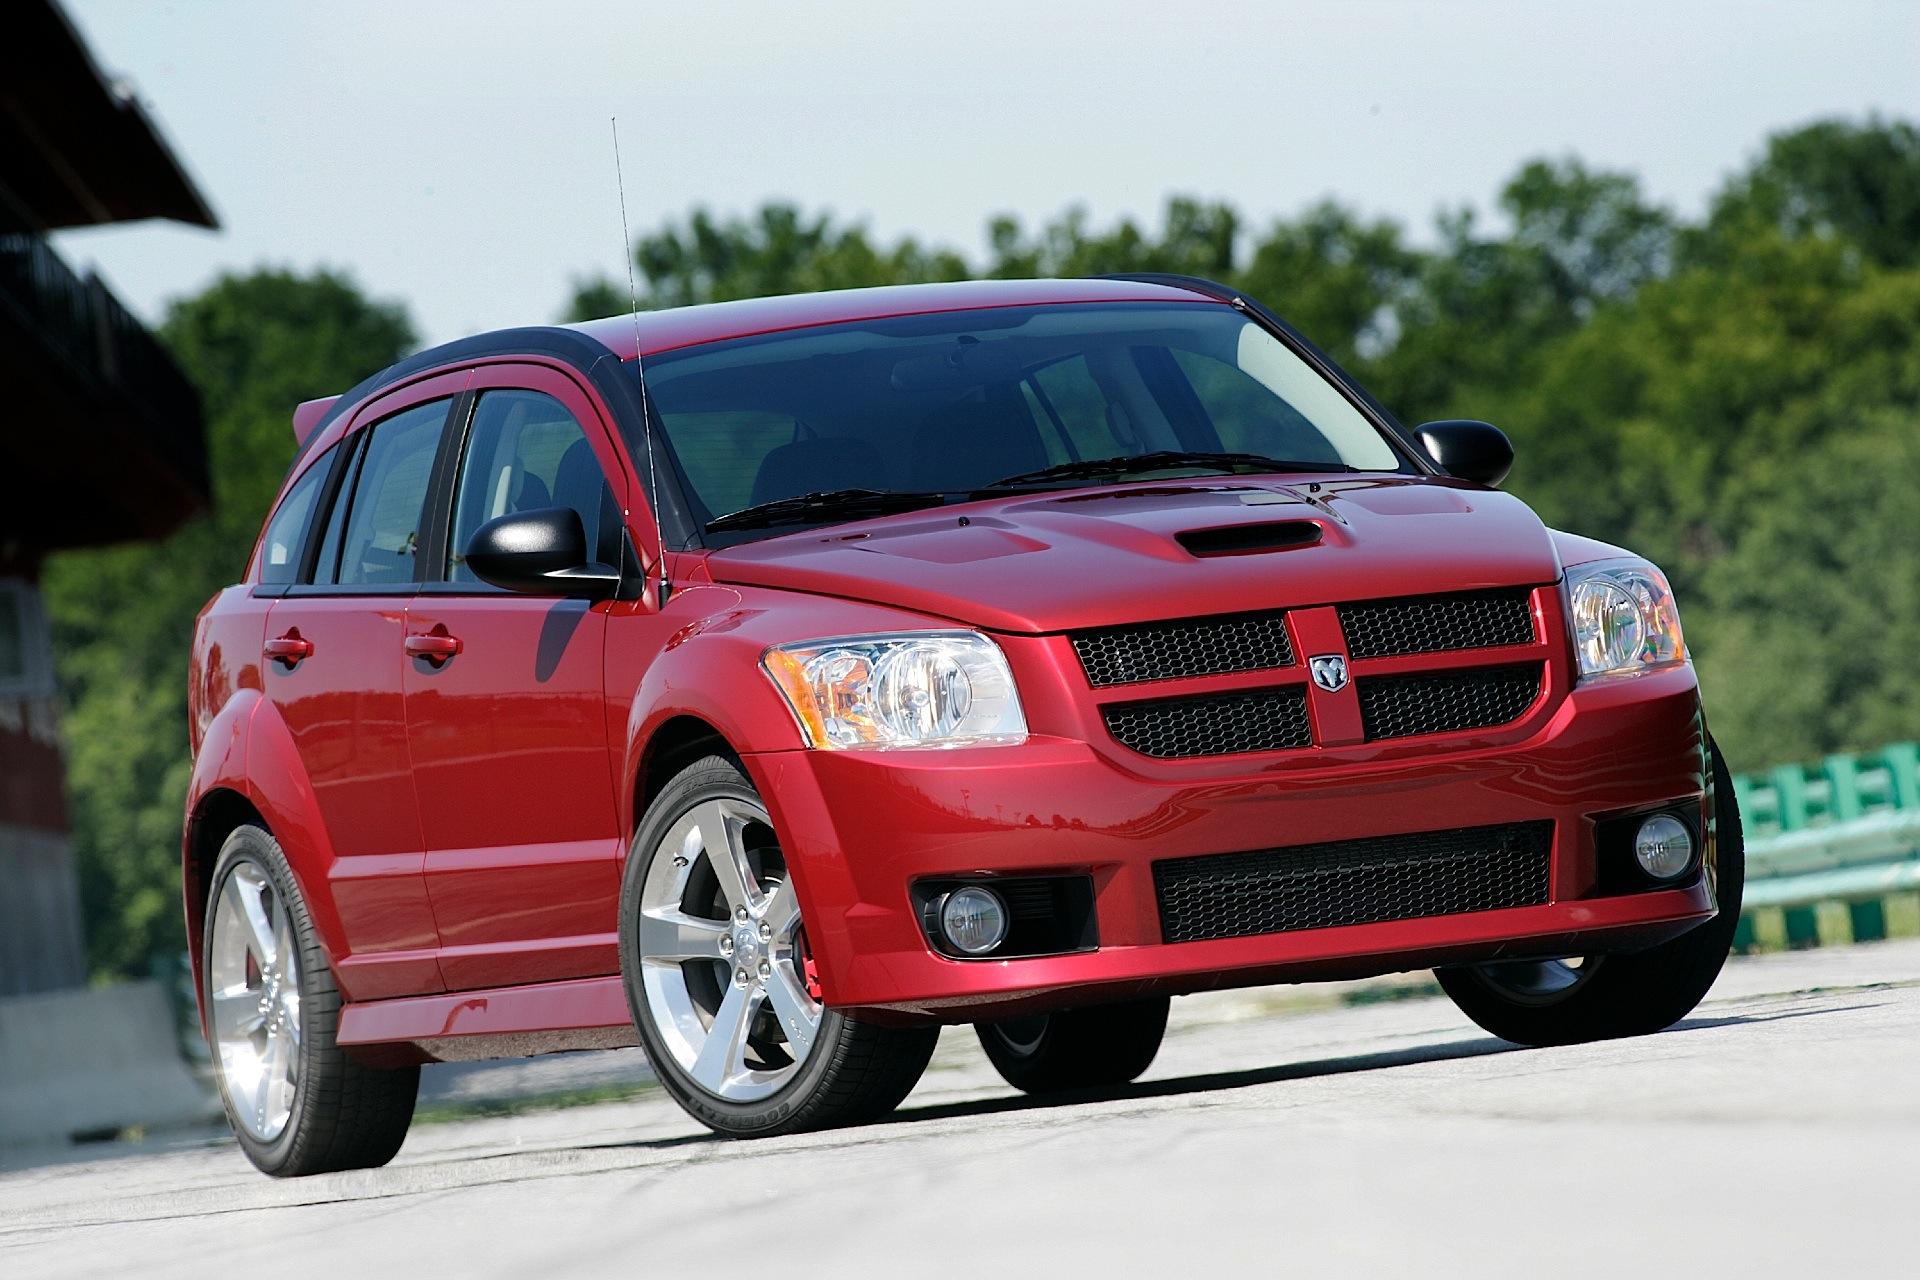 Dodge Caliber Srt on Acura Integra Hatchback